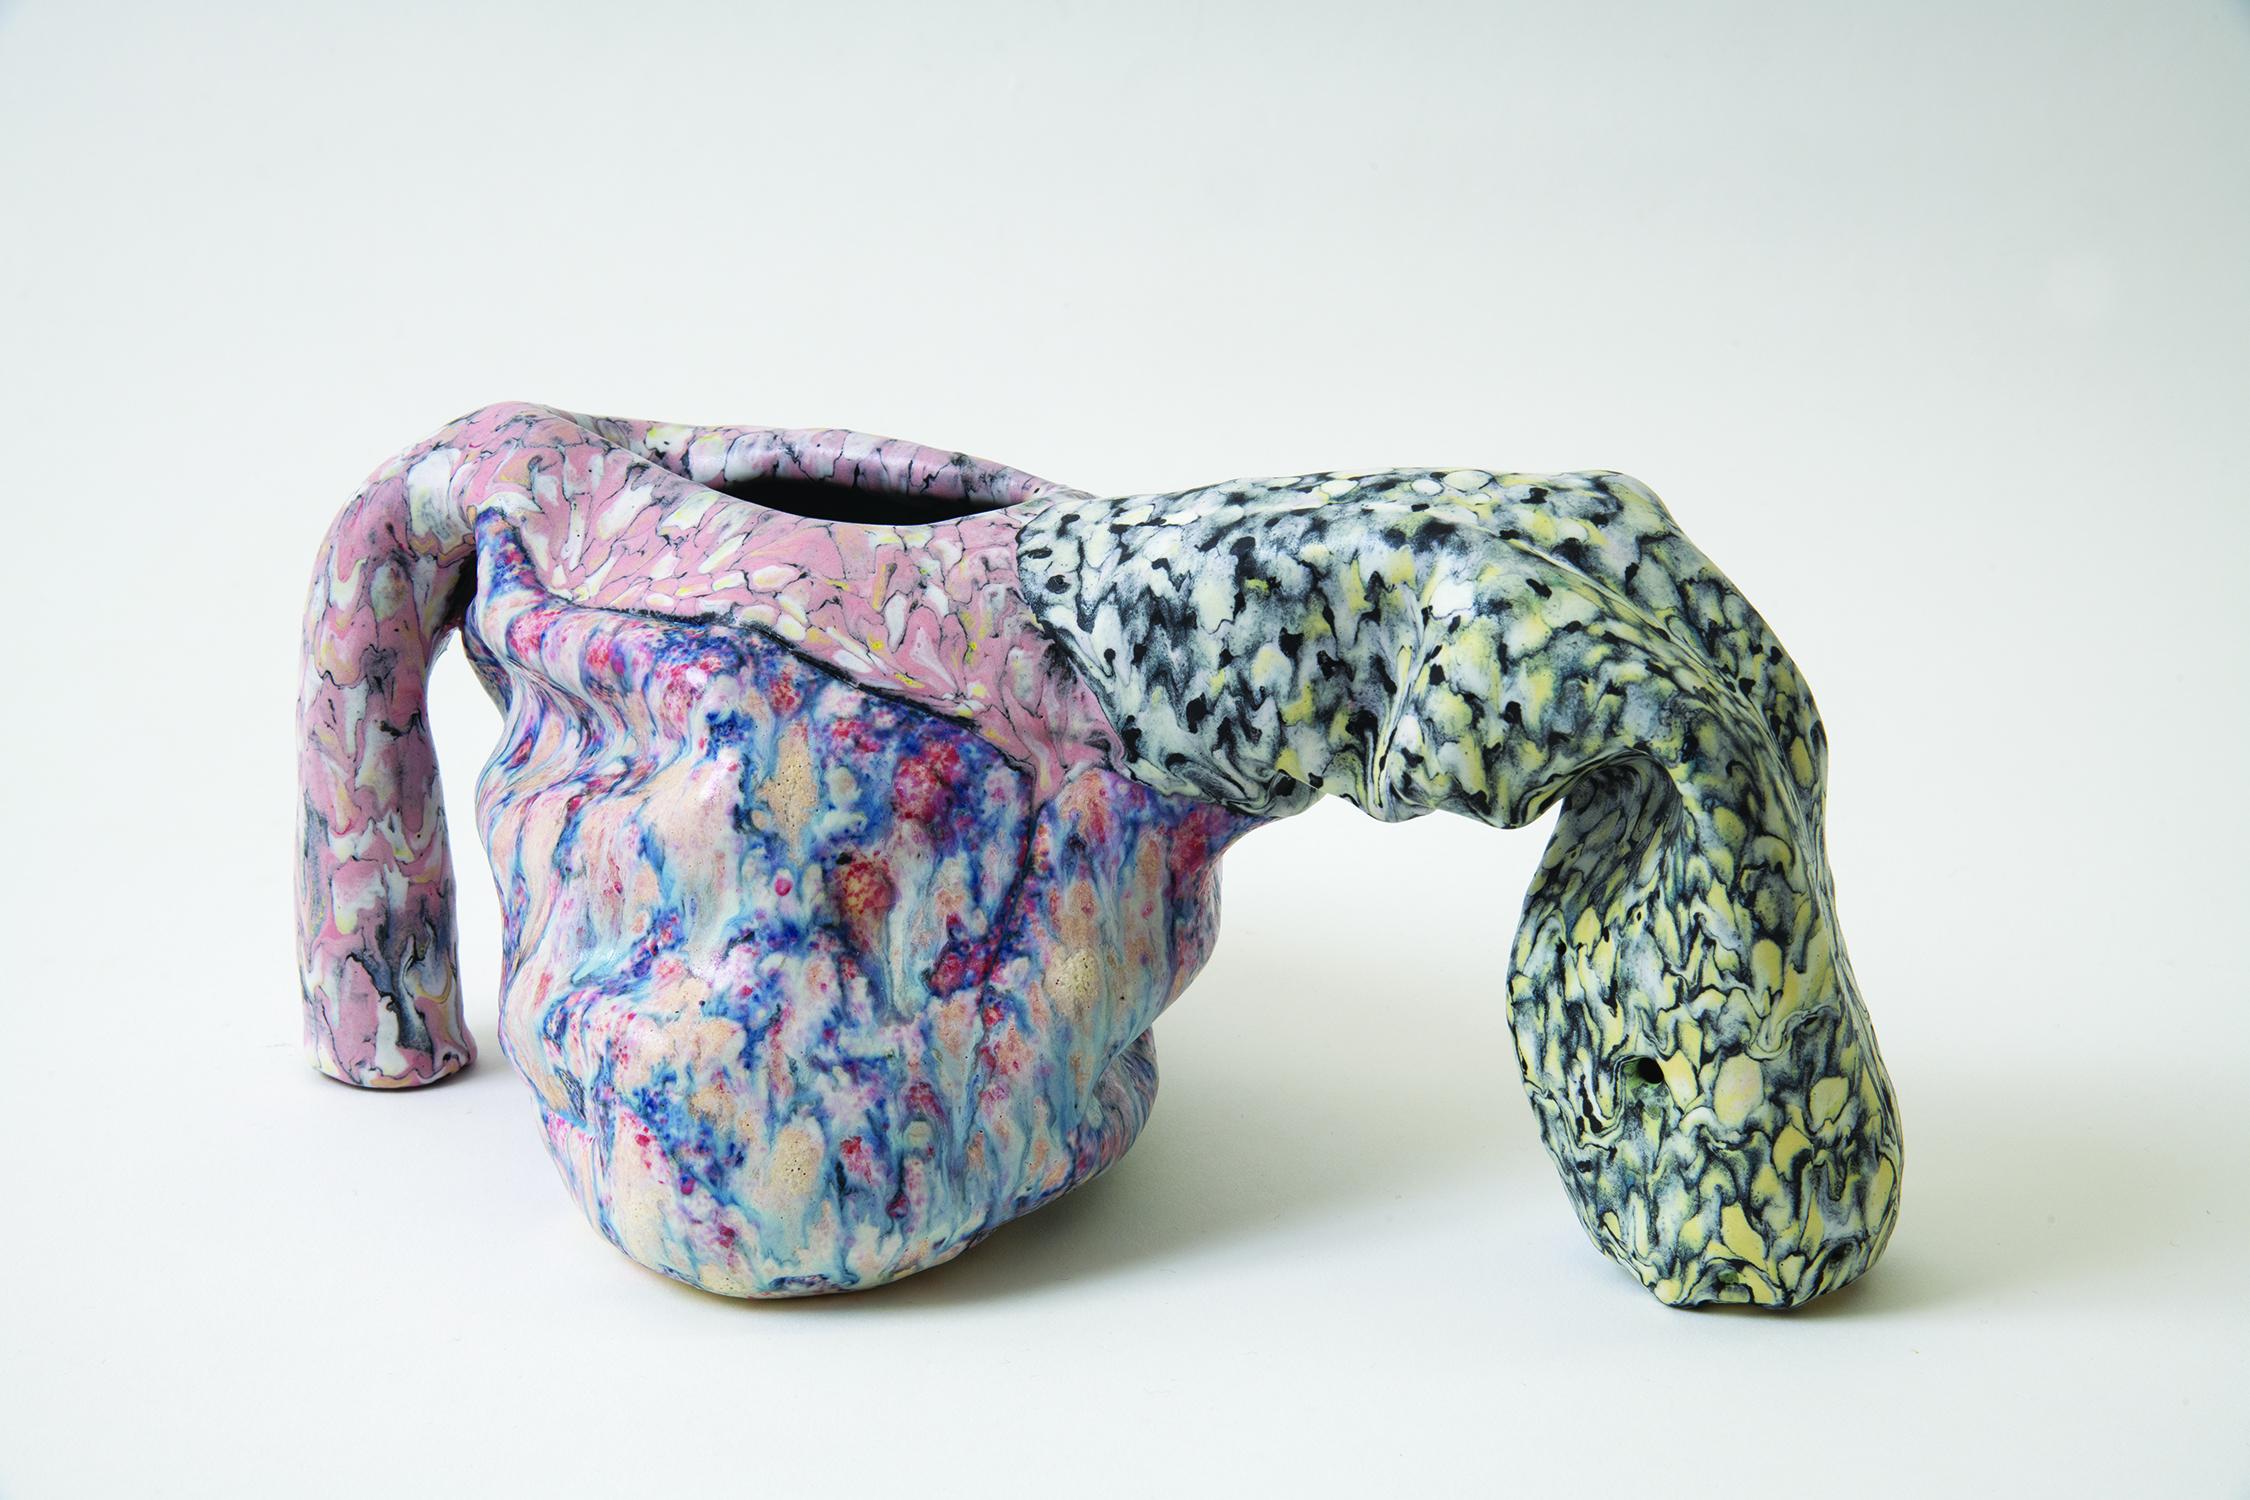 on a limb , 2018 glazed ceramic 6 x 12 x 8.5 inches